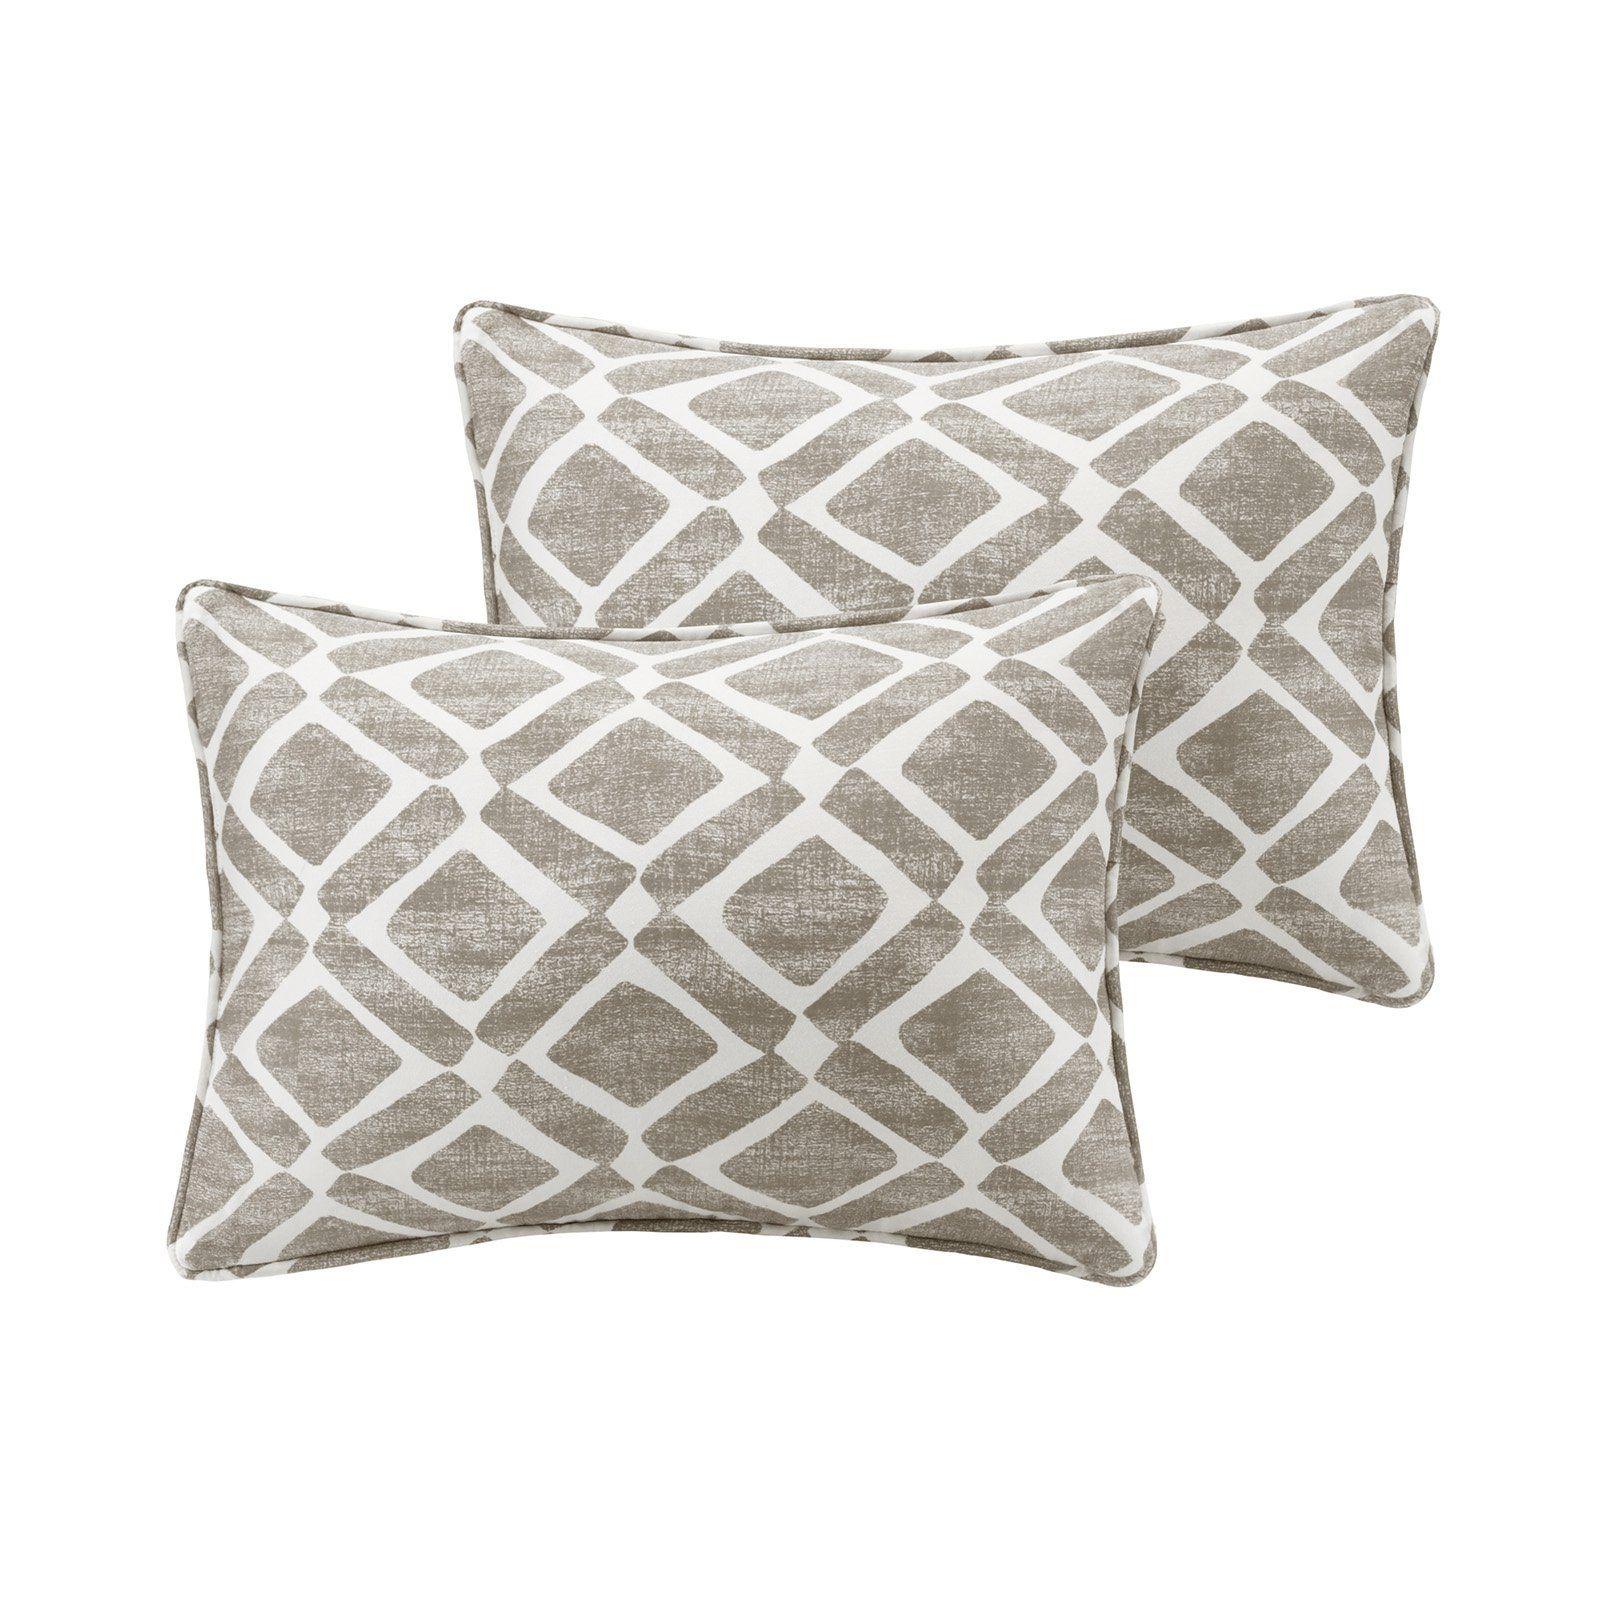 Madison Park Delray Diamond Printed Boudoir Pillow Set Of 2 Gray